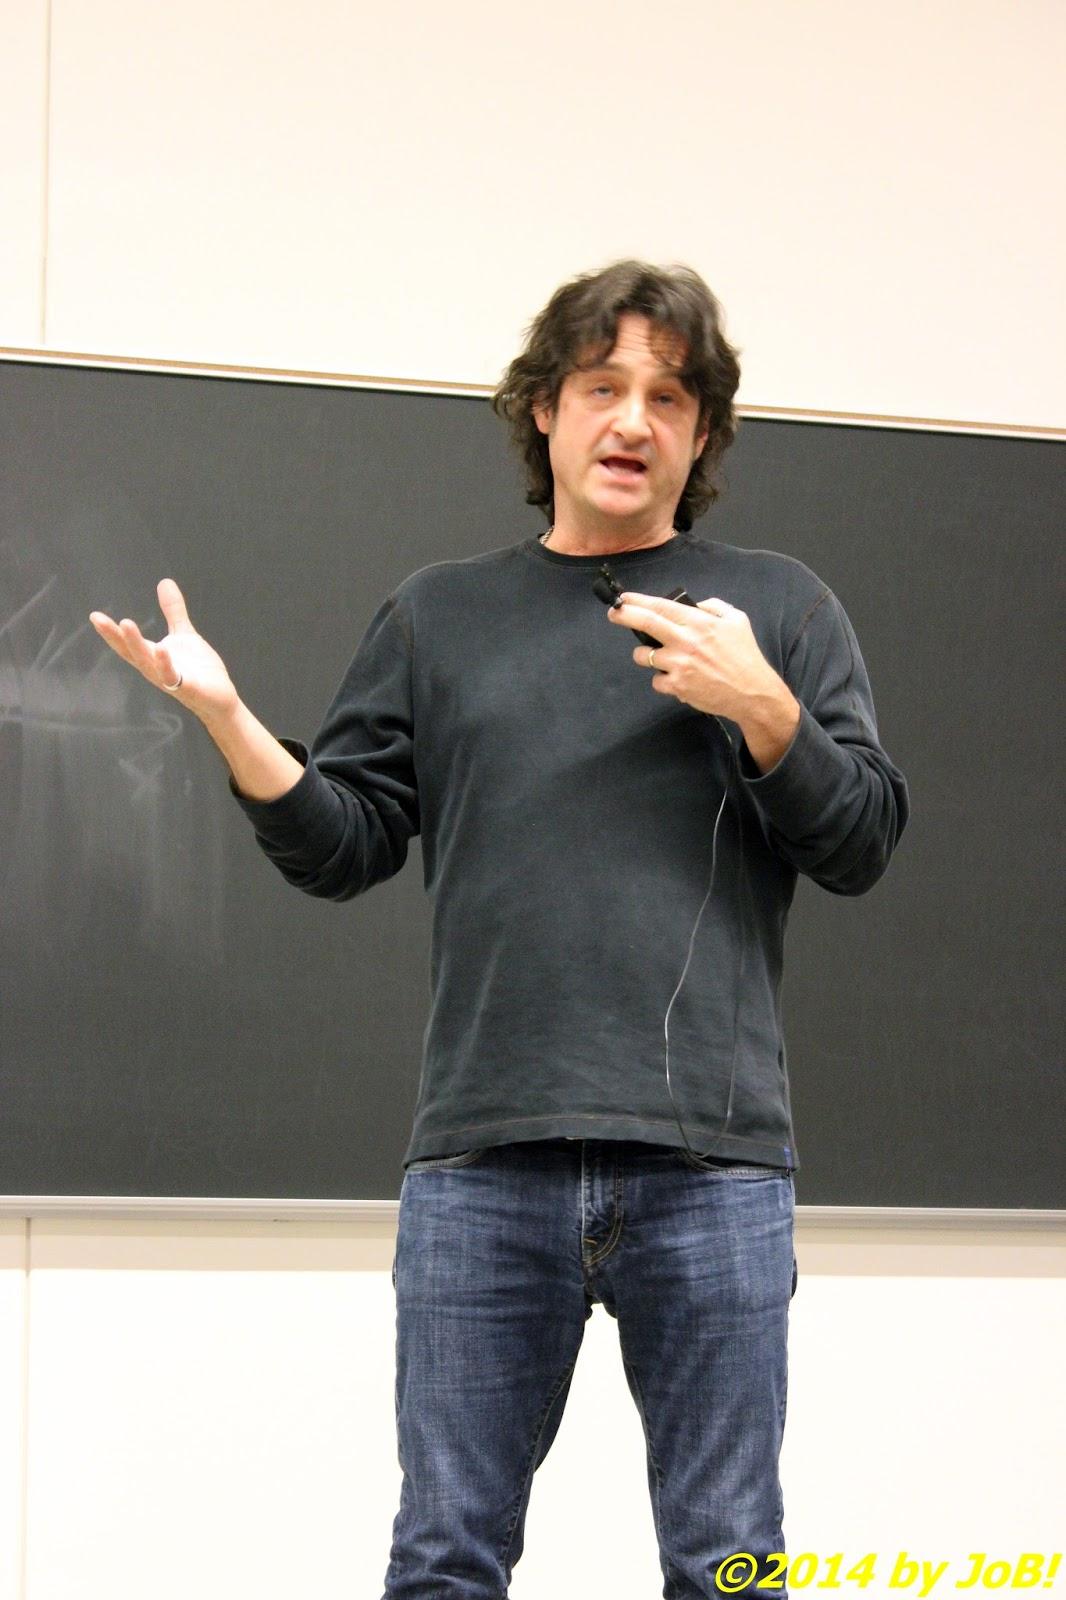 Jeff Smith Books Blog: Journalism Or Bust!: A/V: 2014 SPJ Region 4 Conference